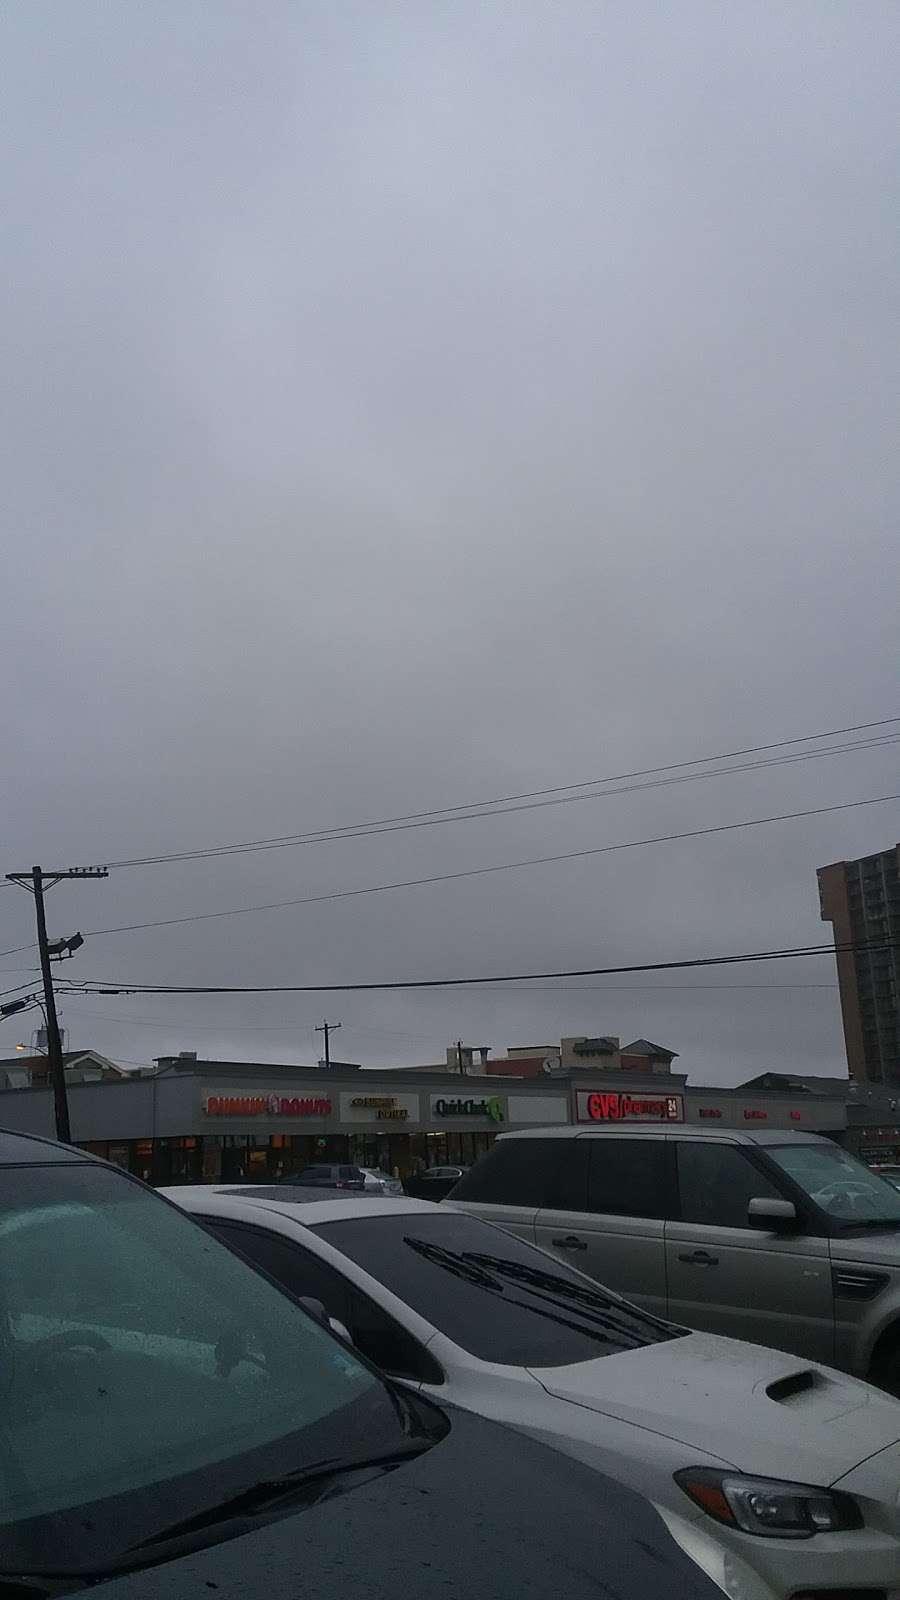 QuickChek - convenience store  | Photo 2 of 3 | Address: 9005 Bergenline Ave, North Bergen, NJ 07047, USA | Phone: (201) 854-9035